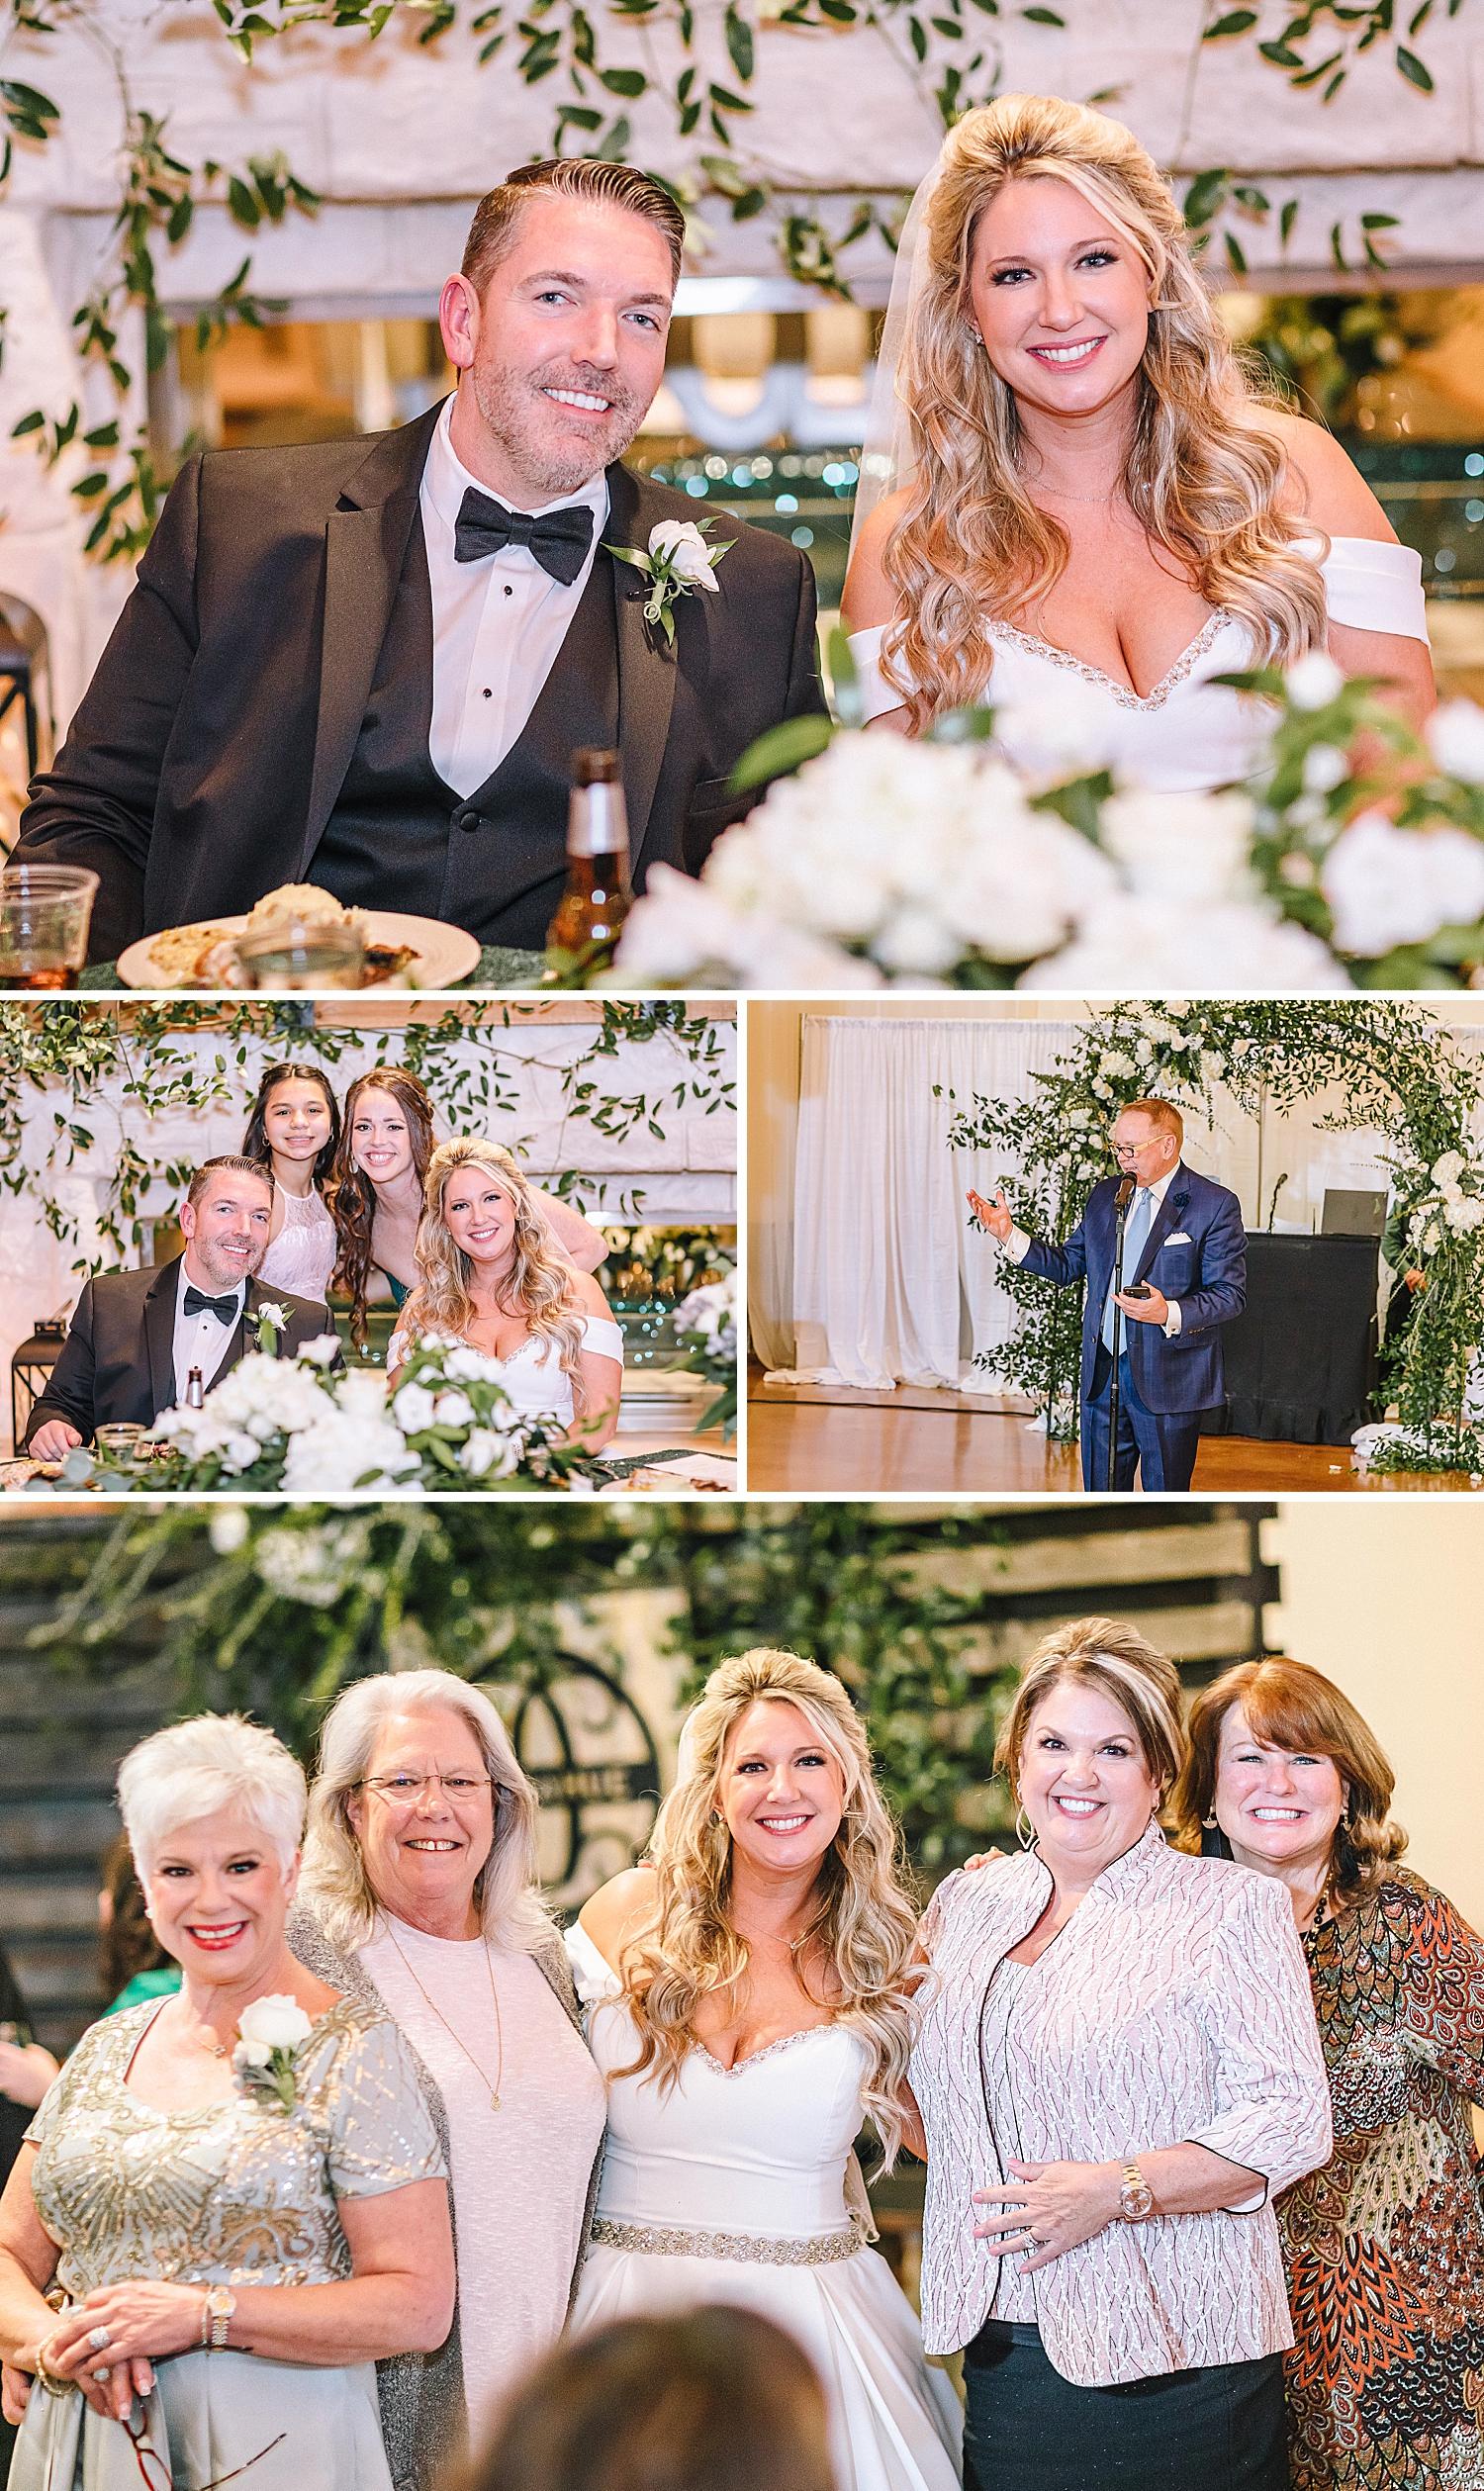 Magnolia-Halle-Wedding-San-Antonio-Texas-Bride-Grom_0085.jpg